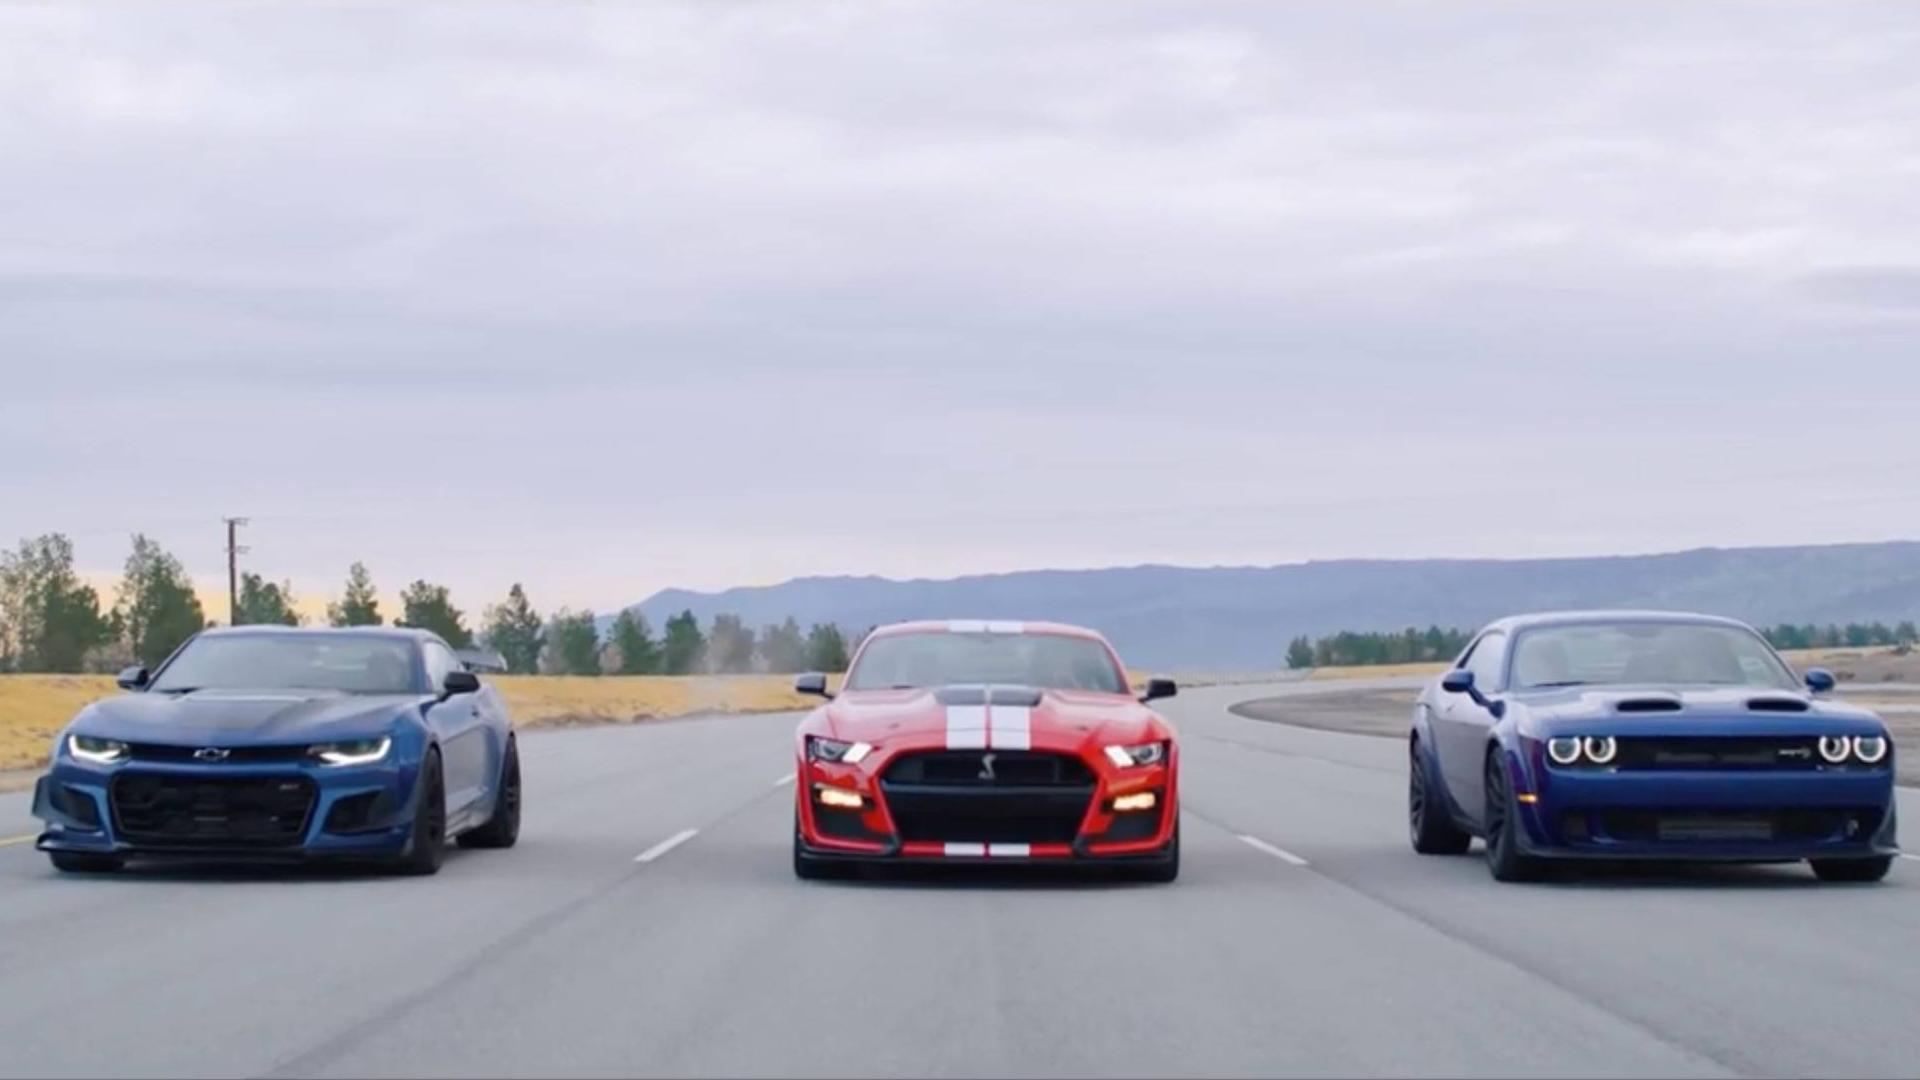 pony内战!谢尔比GT500 VS 挑战者红眼地狱猫 VS 科迈罗ZL1 直线加速赛(生肉)